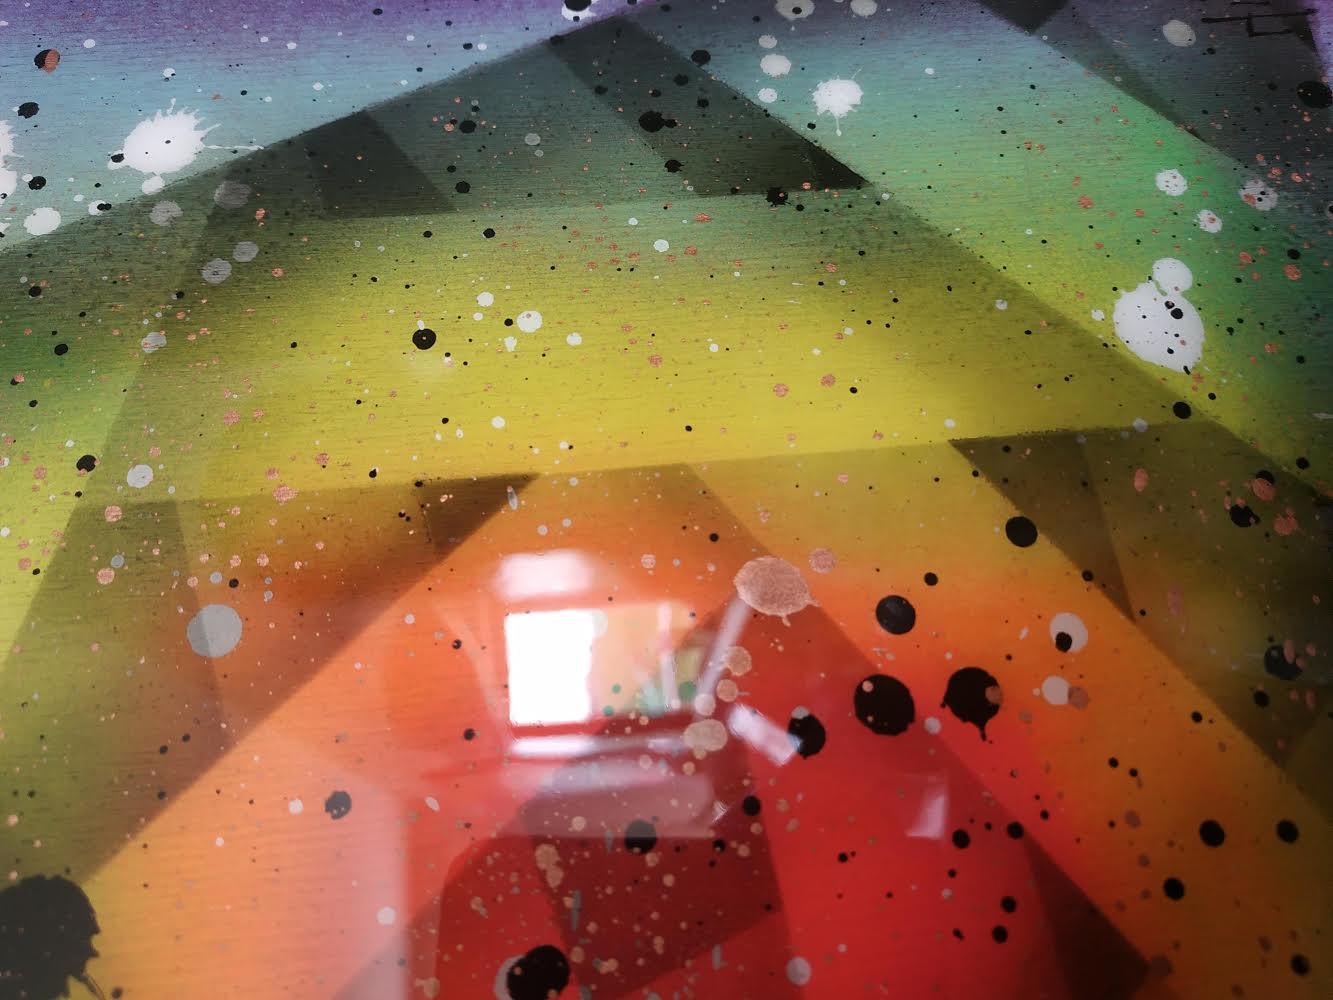 NINU 'COLOUR SPIRIT'-2021- ORIGINAL 1/1 - Image 2 of 11